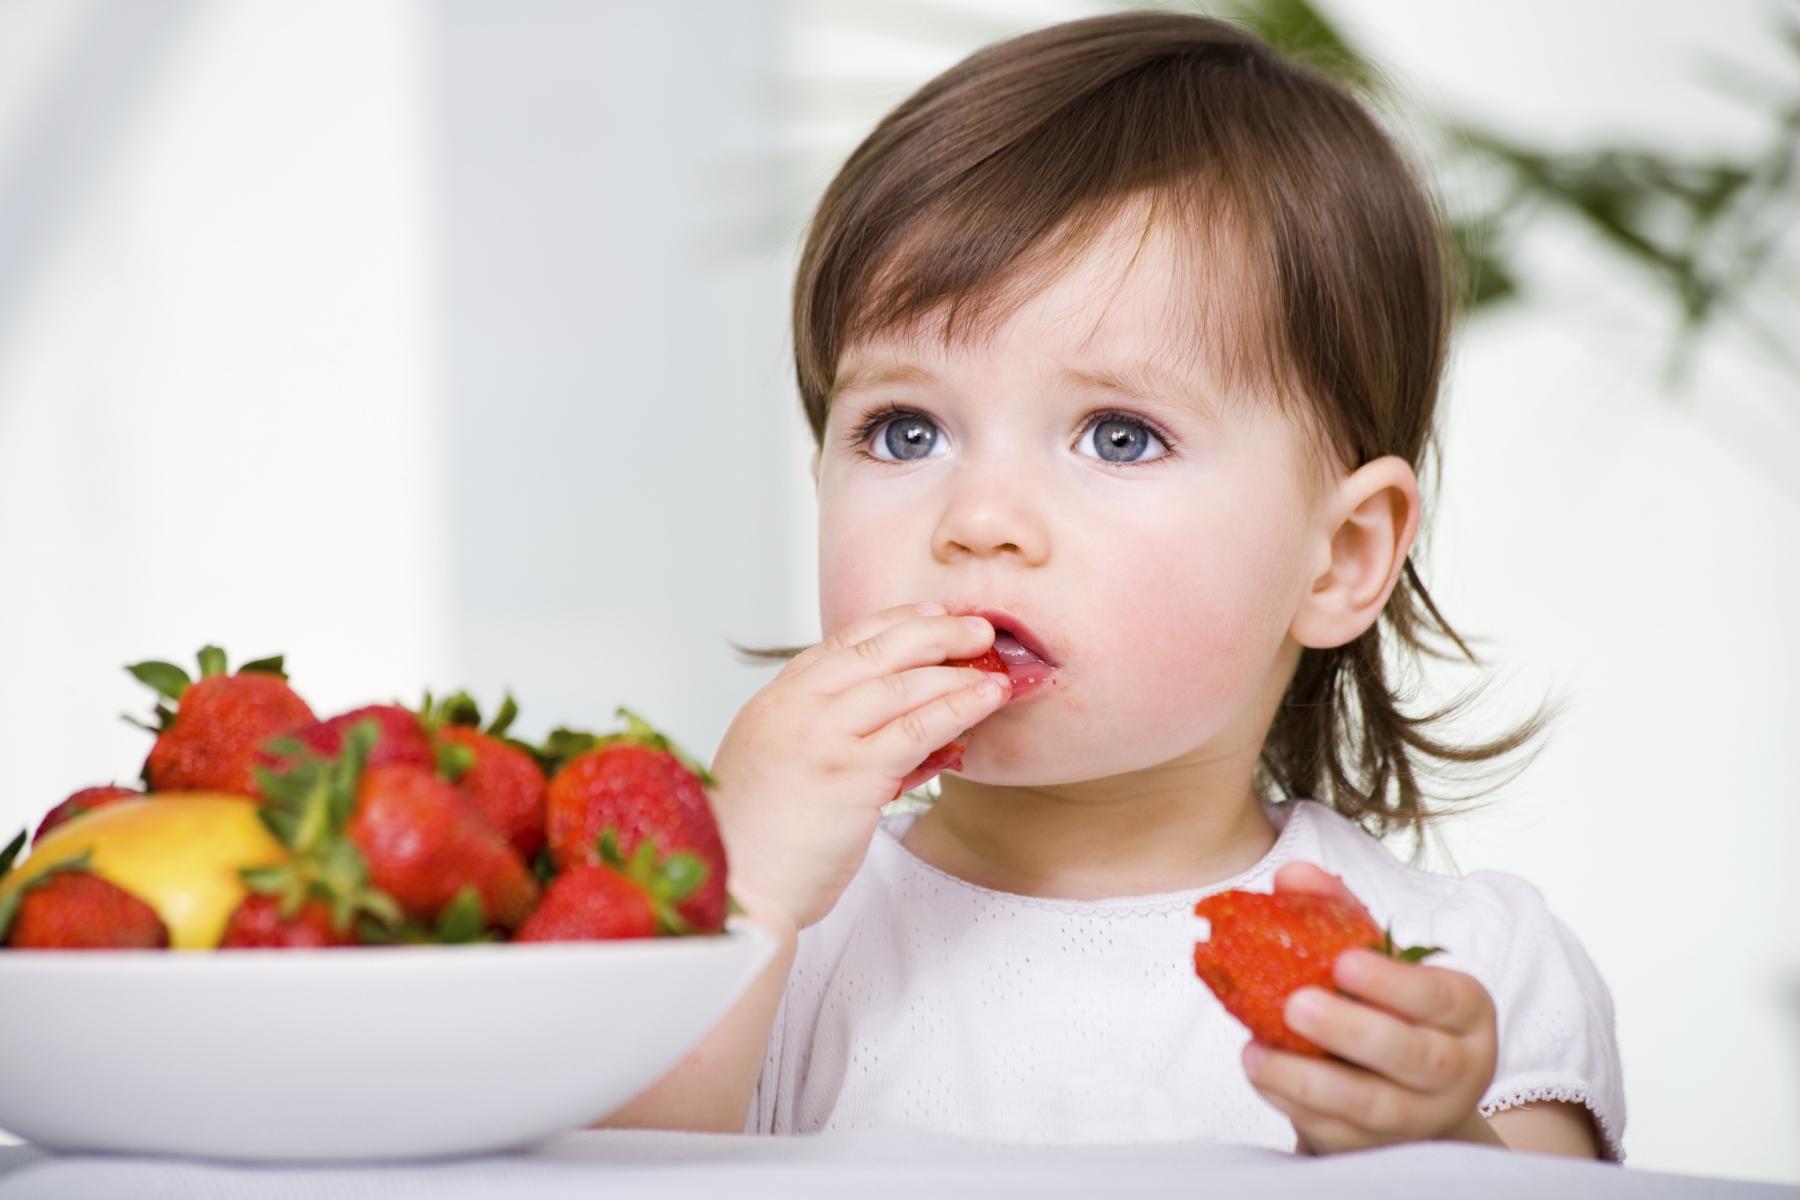 Alimentación infantil, un aprendizaje contínuo